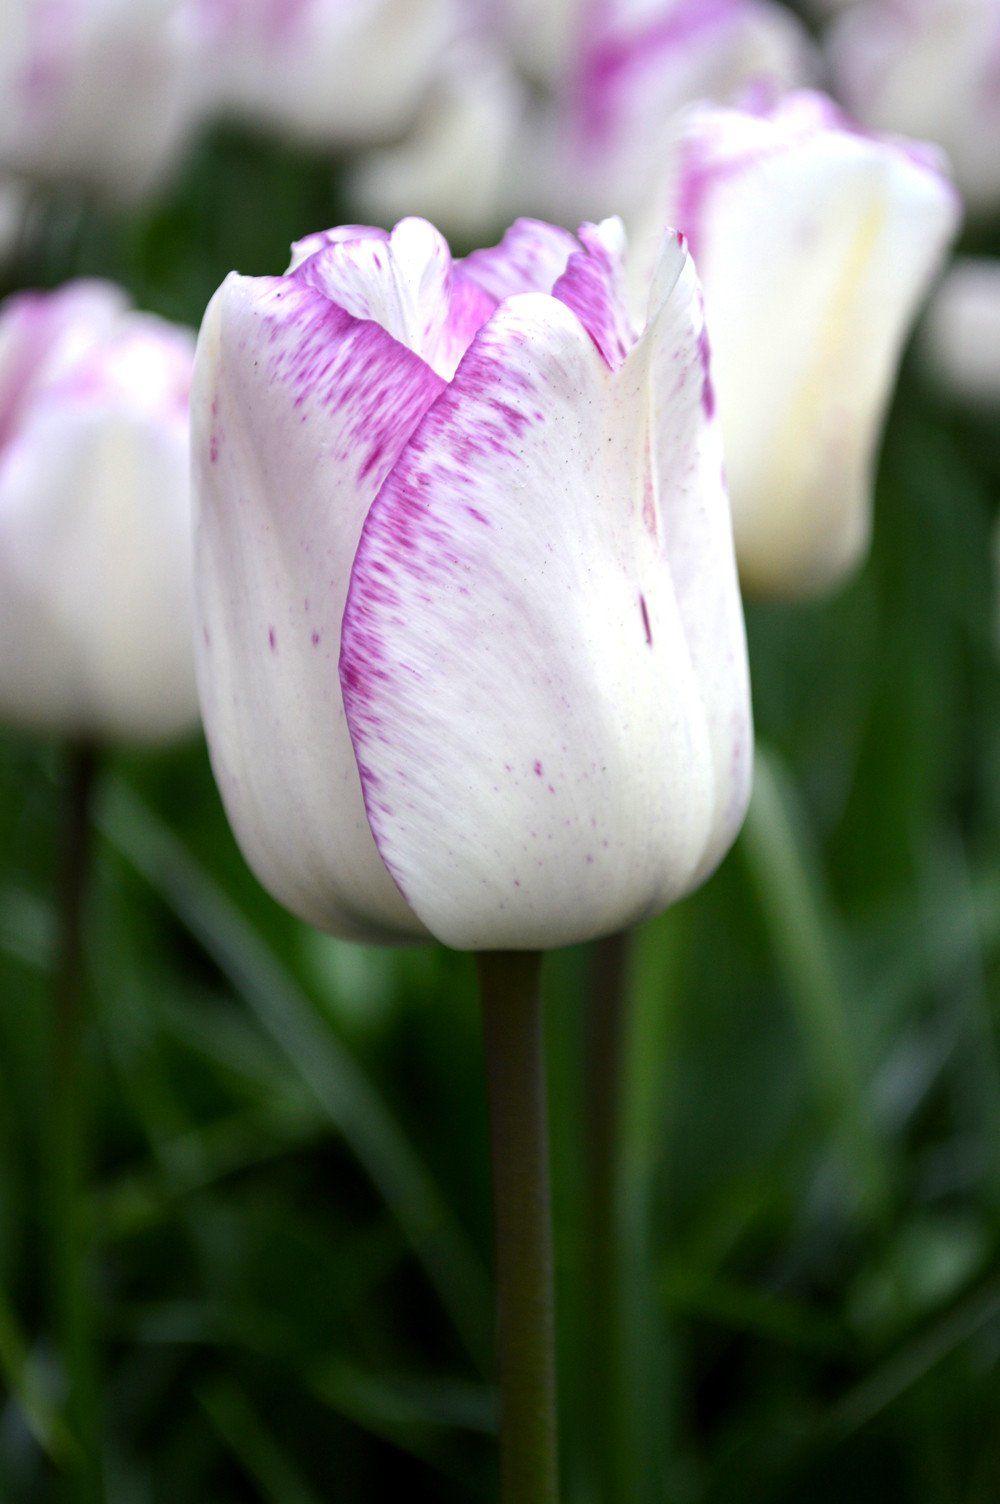 Tulip Shirley Top size bulbs Bulb flowers, Tulips, Tulip